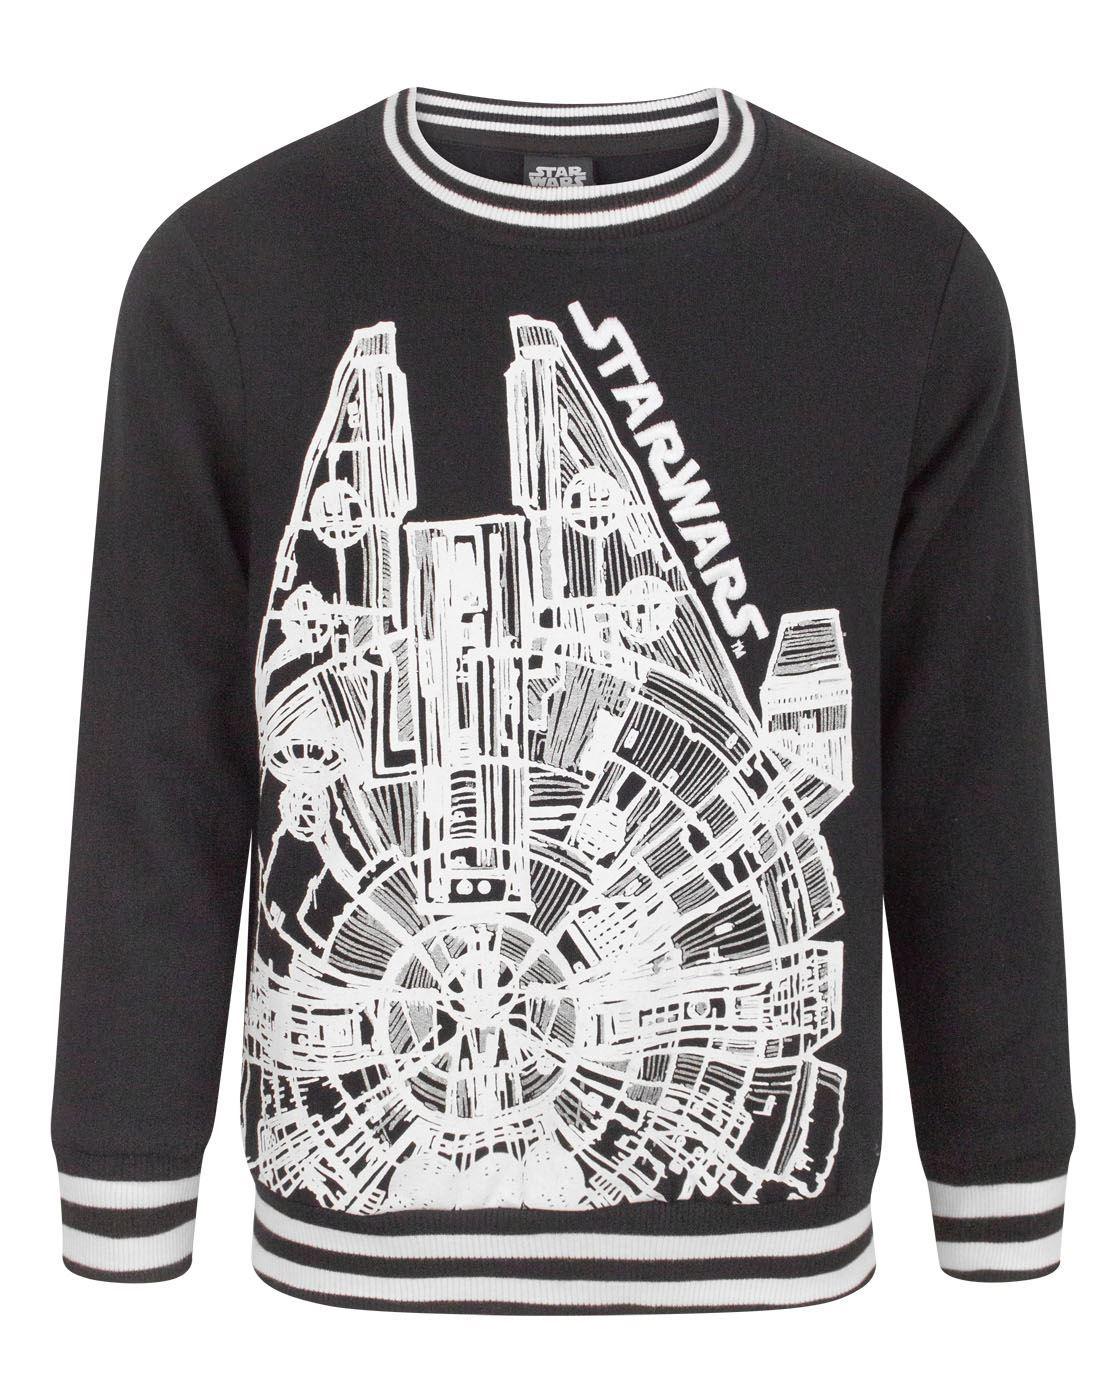 Black Boys T-shirt Star Wars Millenium Falcon 3-4 Years